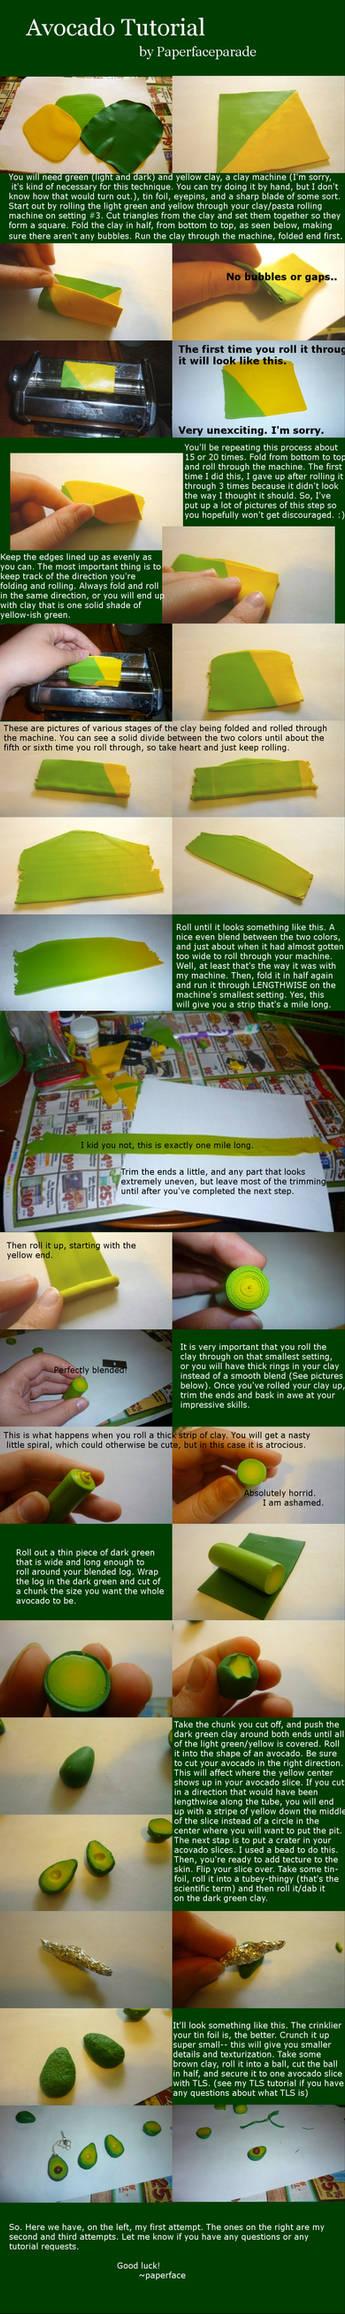 Avocado Cane/Skinner Blend Polymer Clay Tutorial